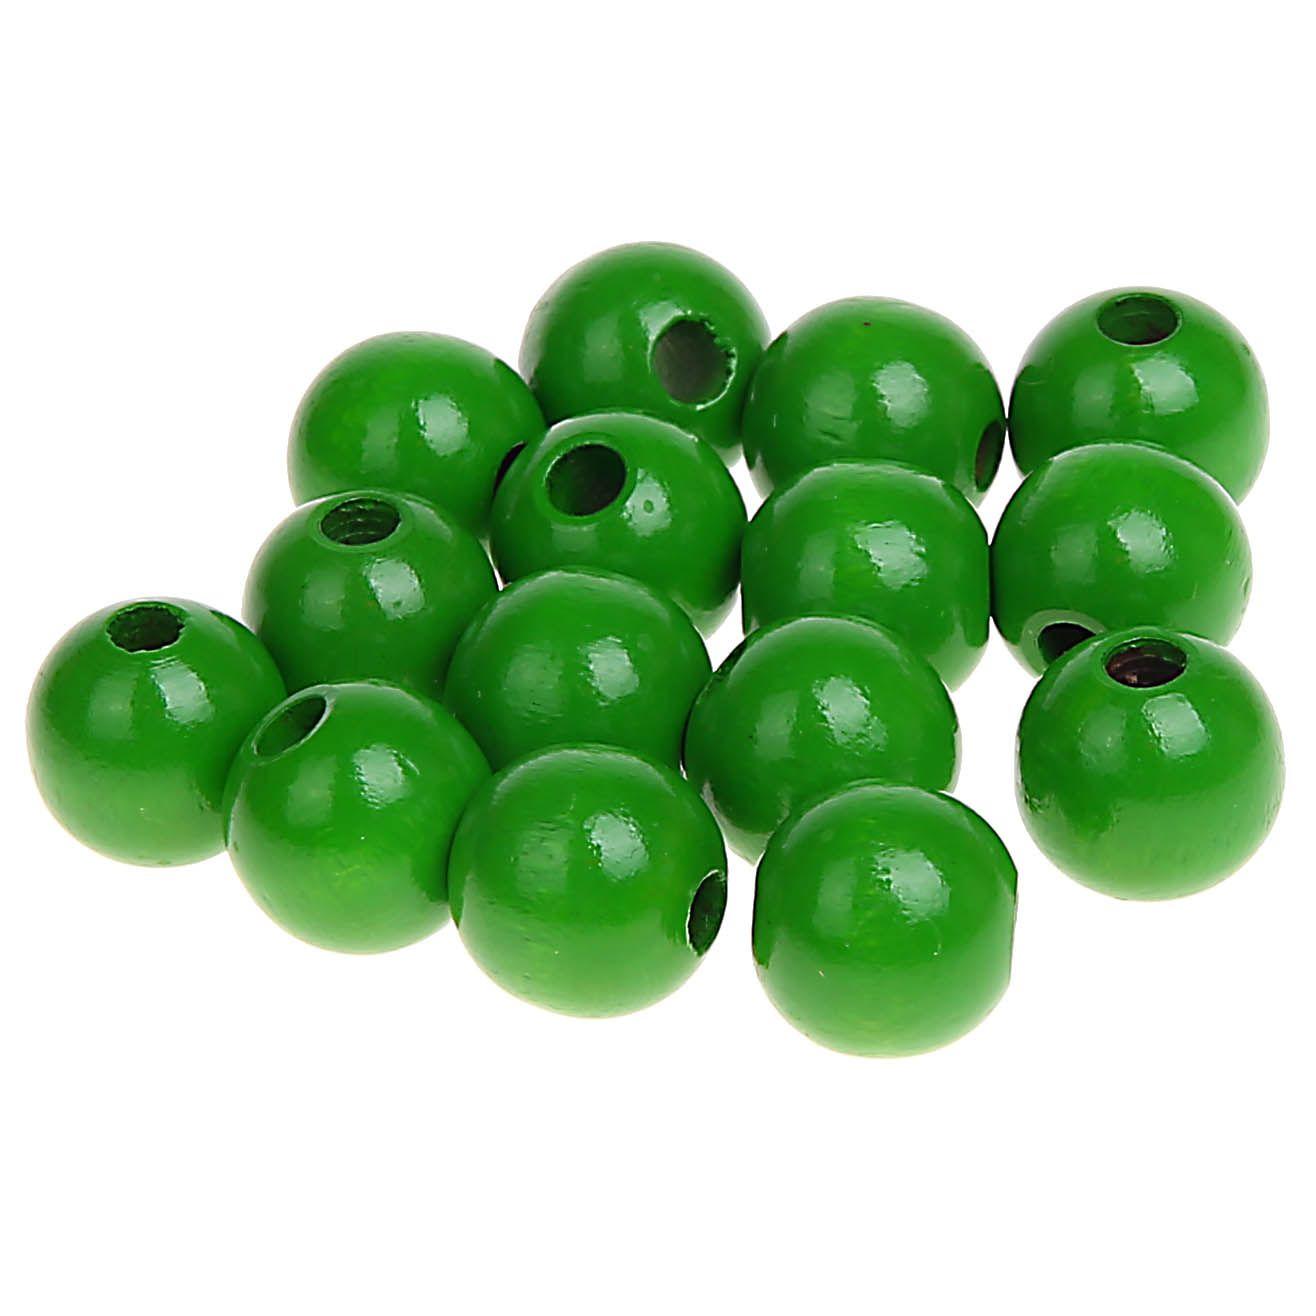 Holzperlen 12mm • 30 Stück 'grün' 0 auf Lager